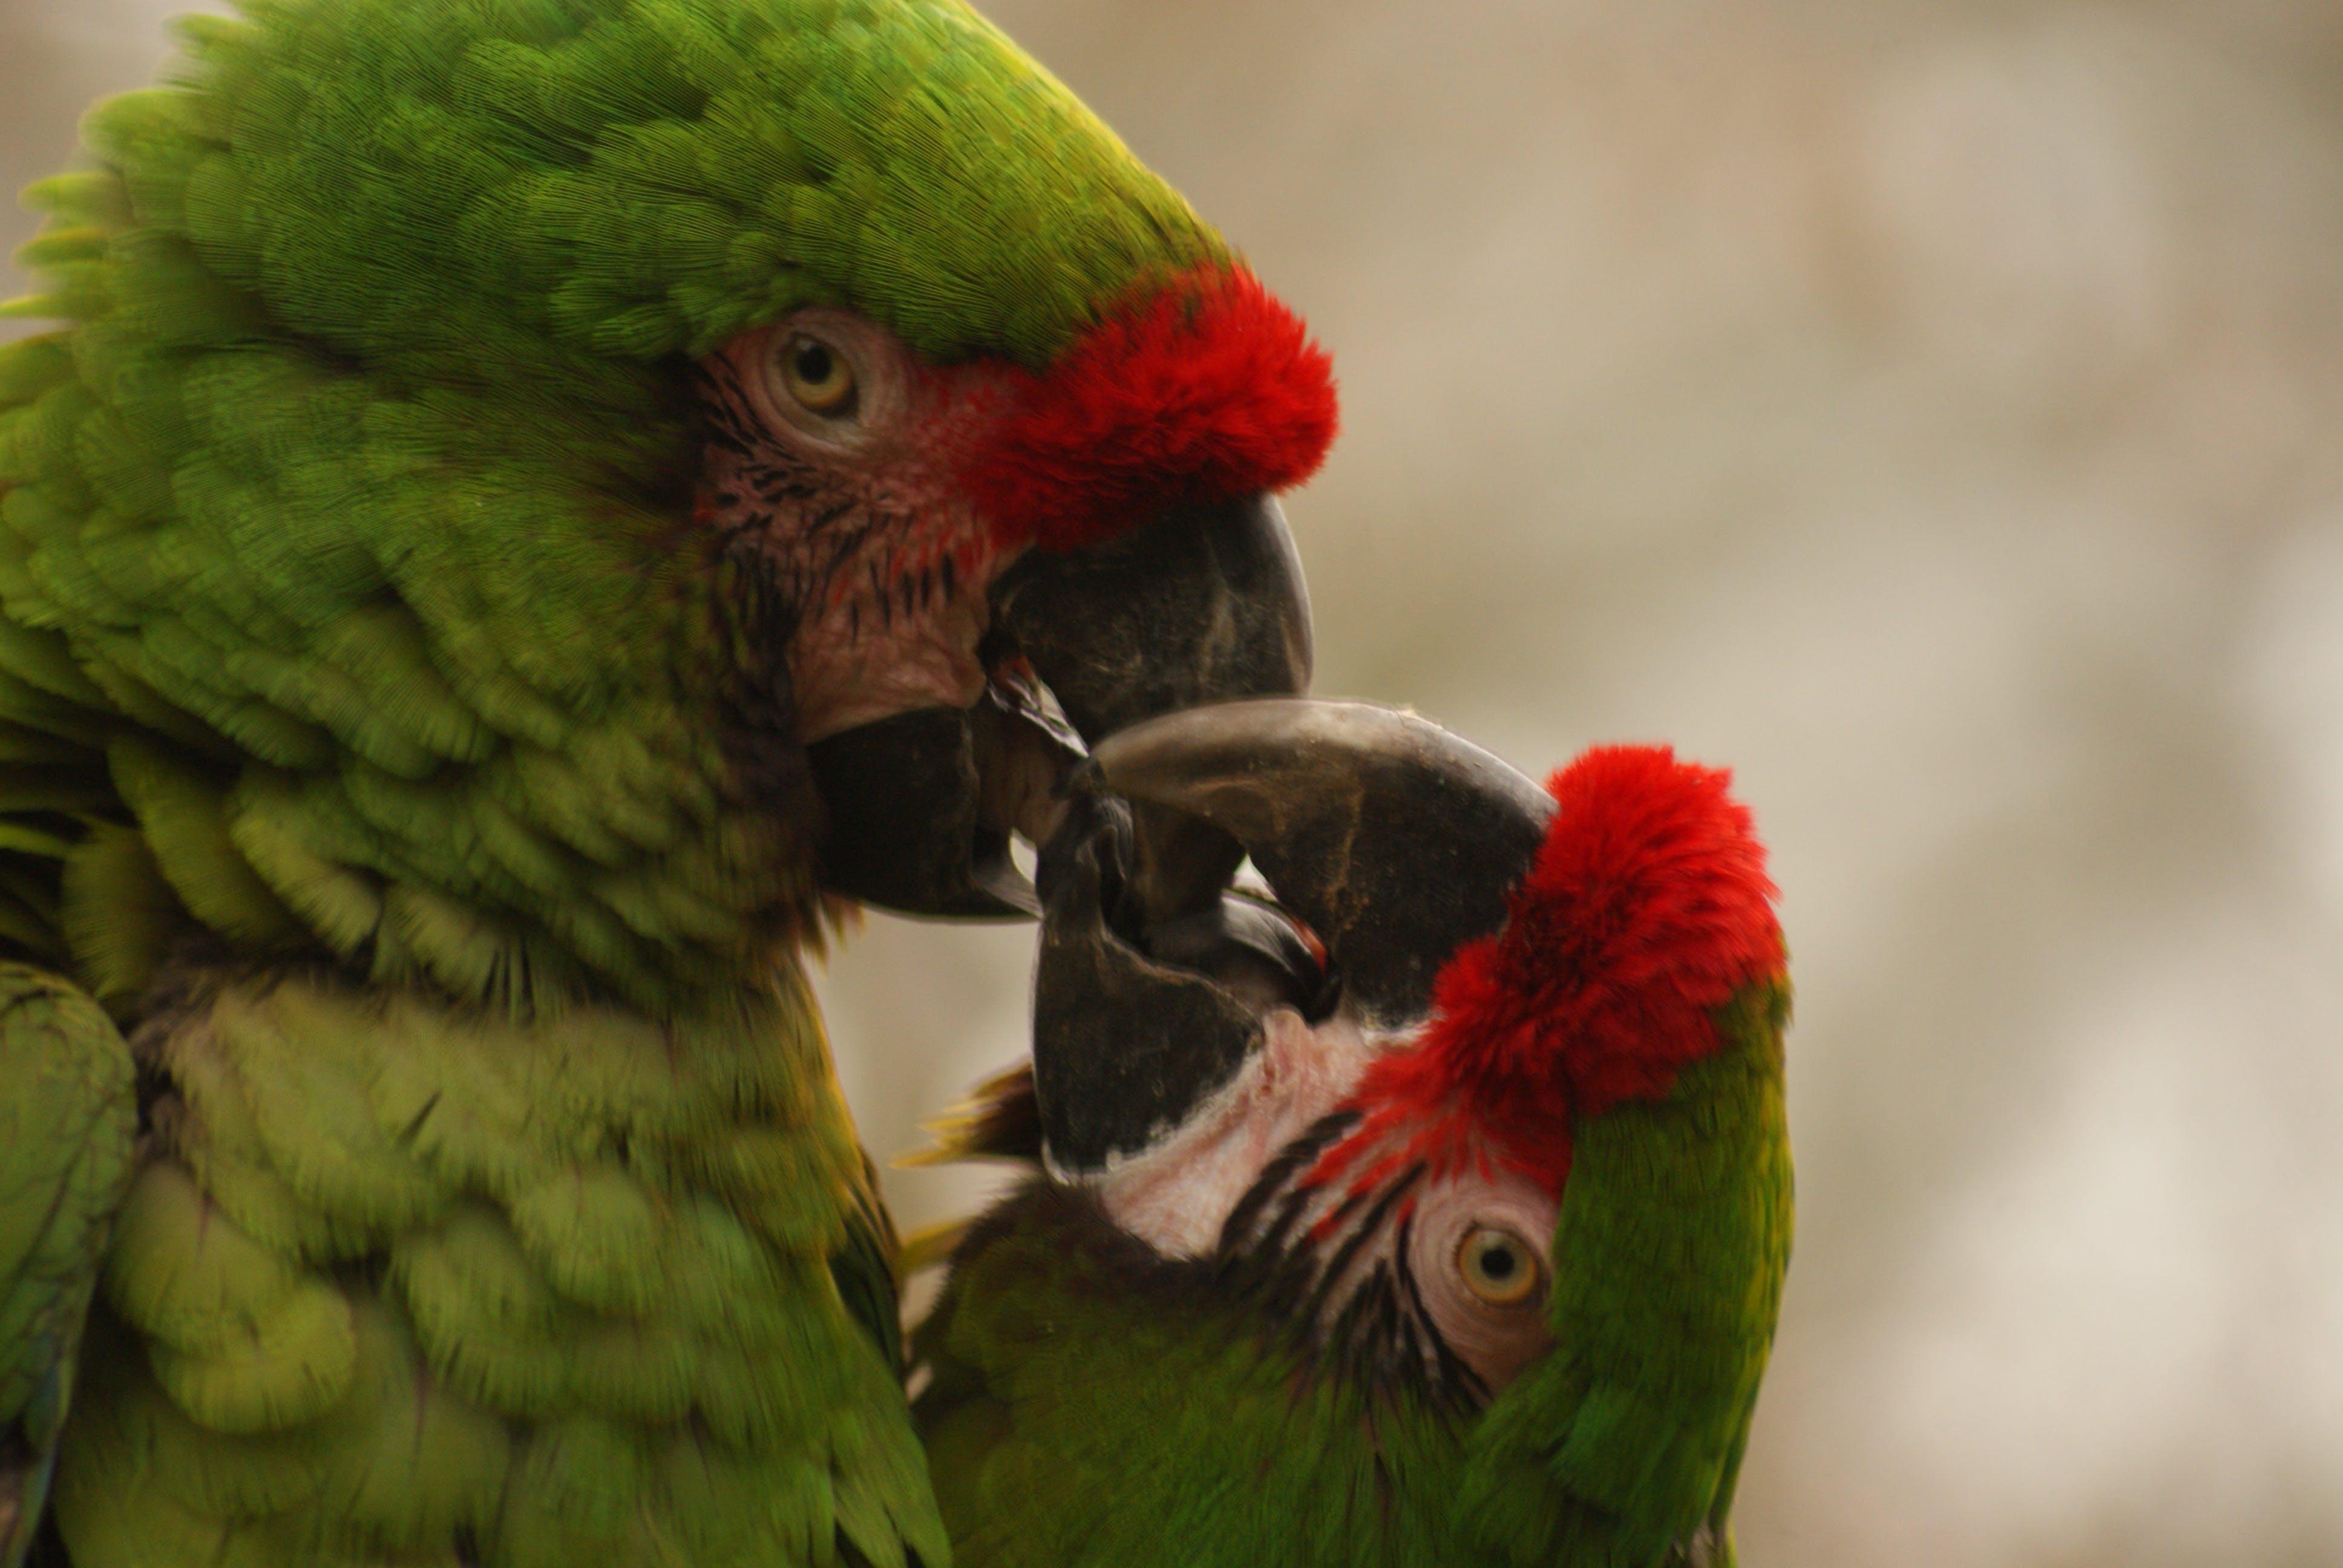 Free stock photo of nature, bird, red, love